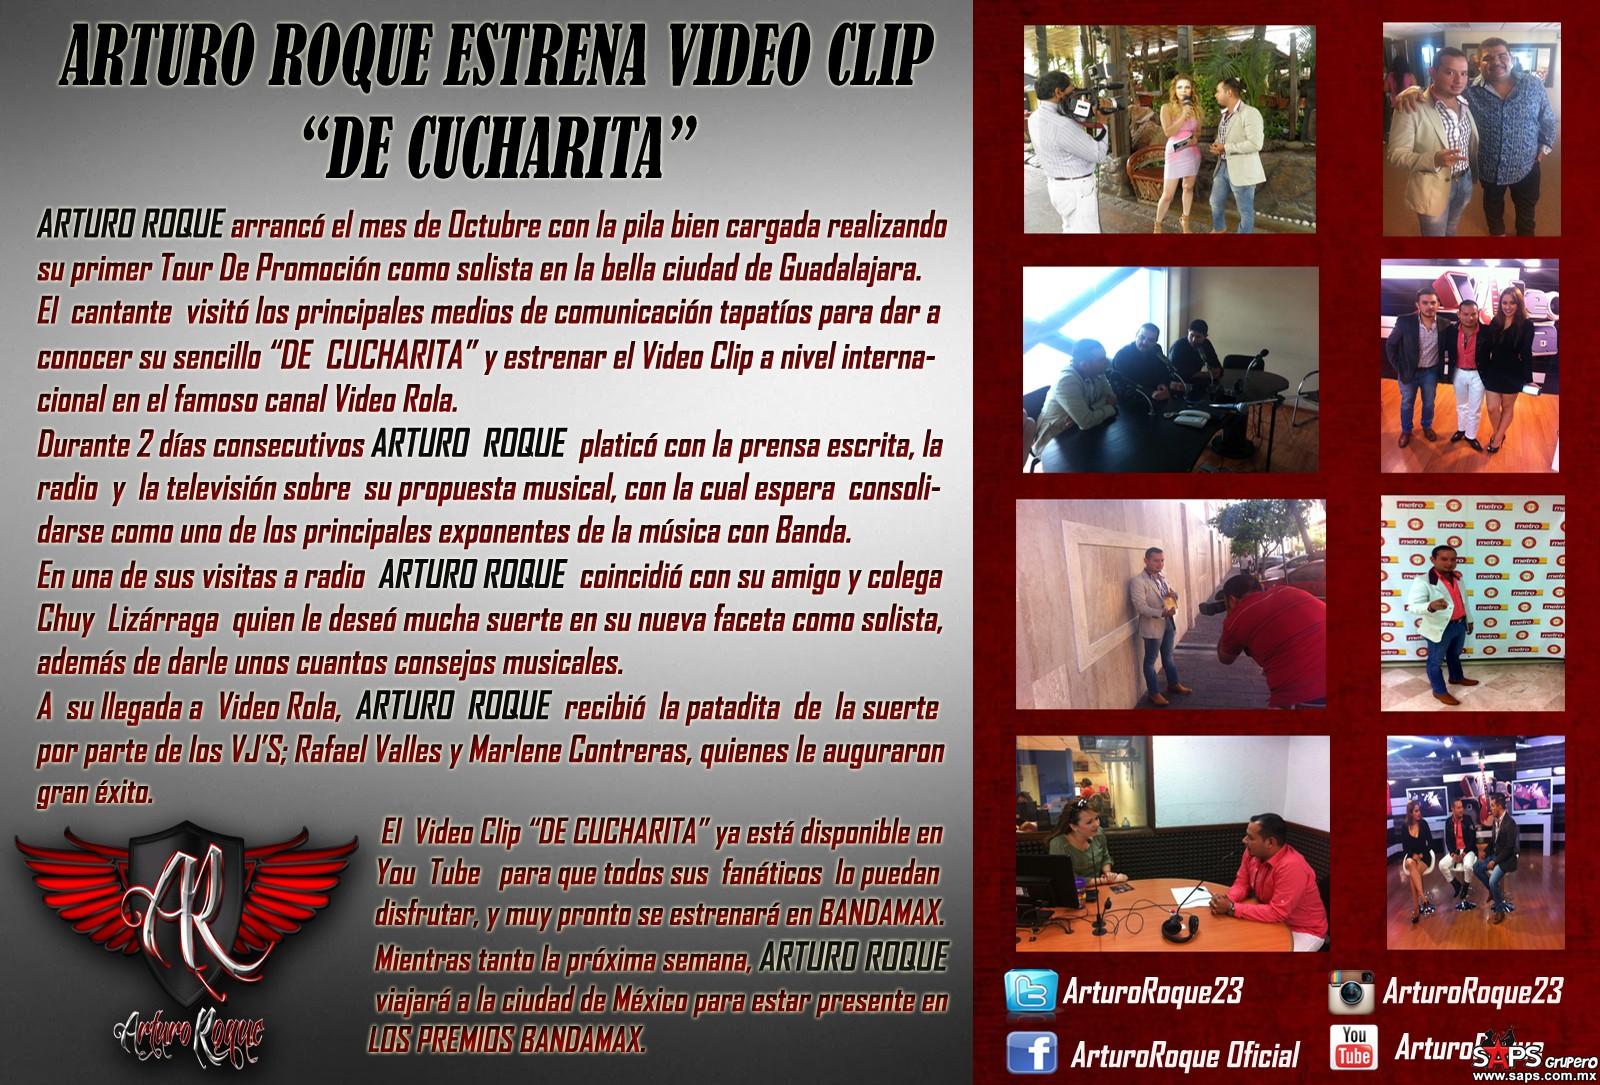 "Arturo Roque estrena video clip ""De Cucharita"""